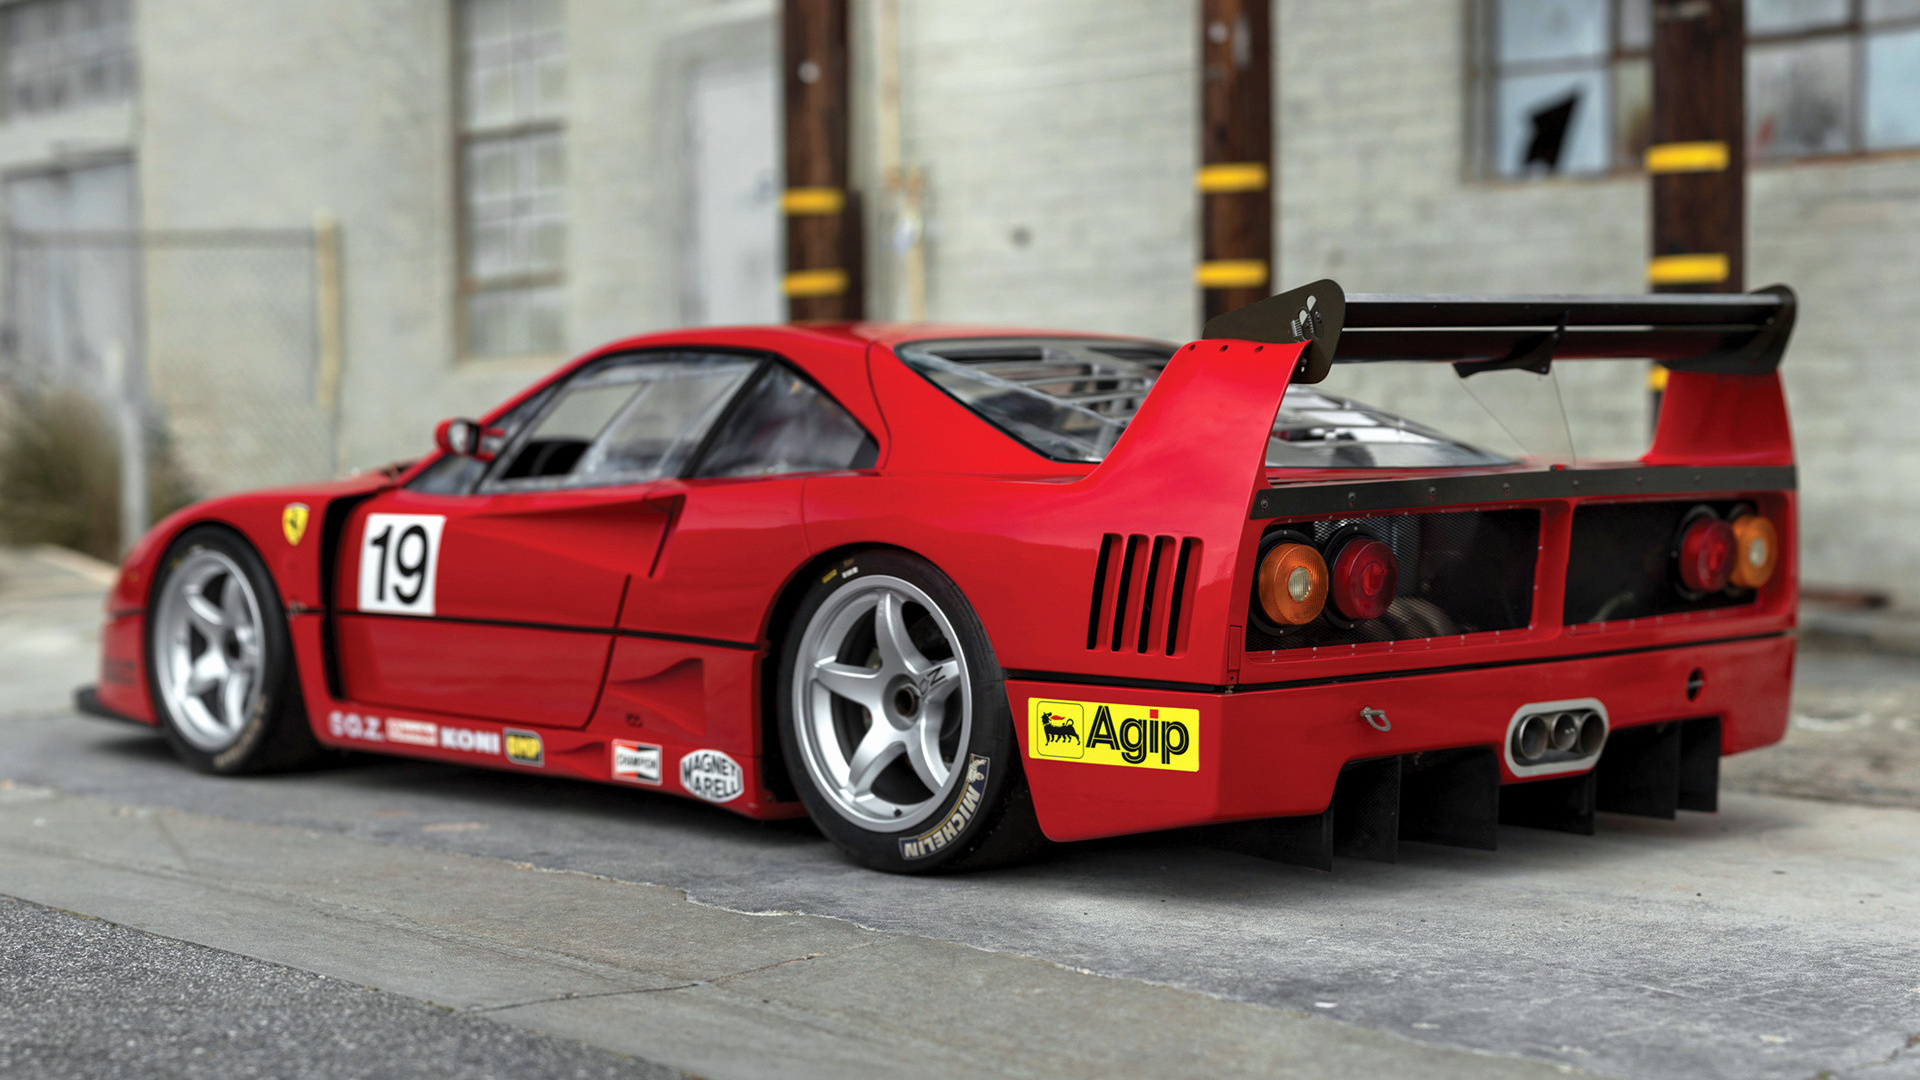 1993 Ferrari F40 Lm 97904 Wallpapers And Hd Images Car Pixel